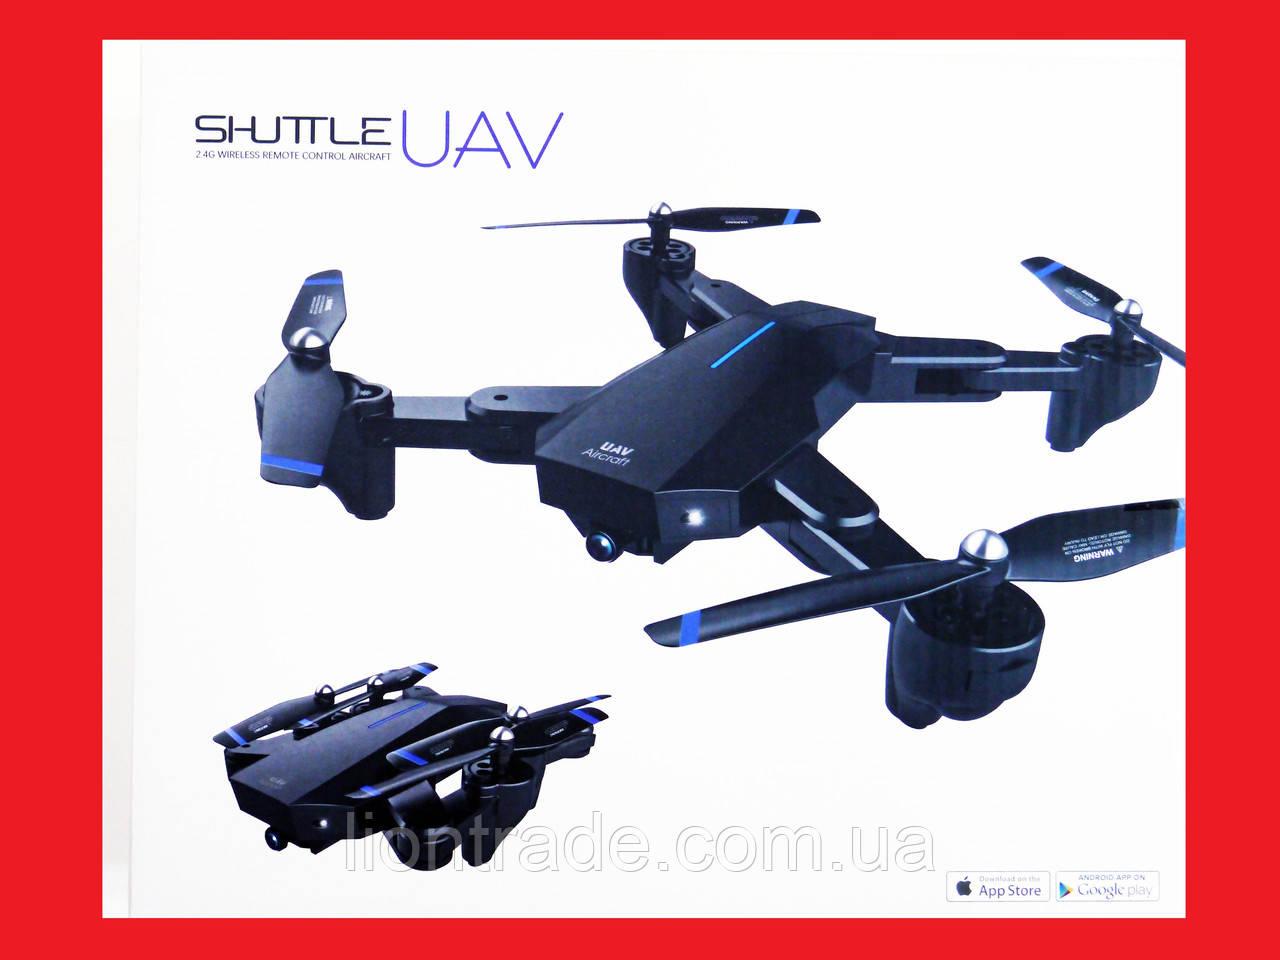 Квадрокоптер Shuttle UAV Aircraft c WiFi камерой складывающийся корпус